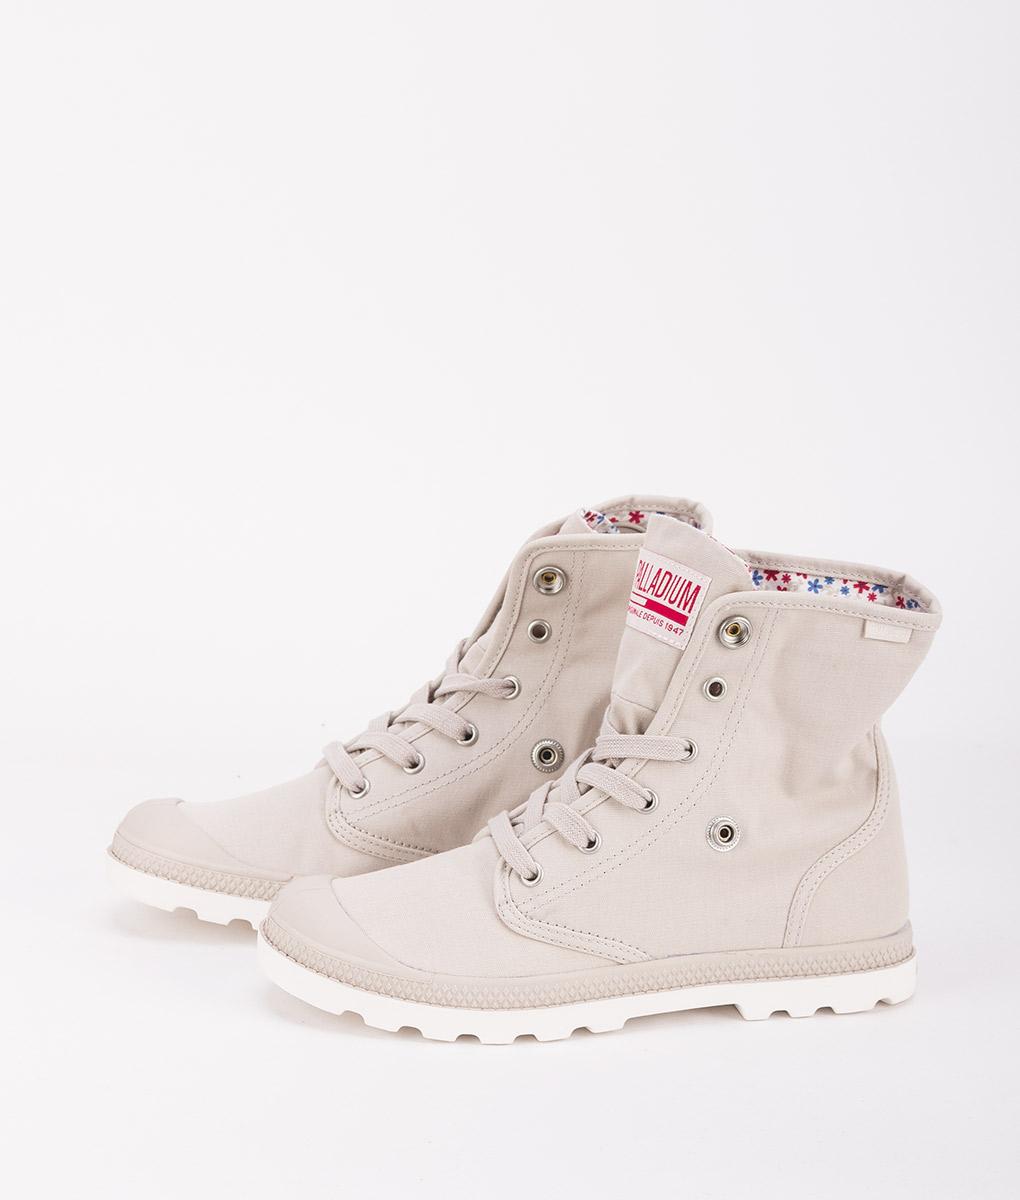 PALLADIUM Women Sneakers 93314 BAGGY LOW LP, Rainy Day Marsmallow 74.99.CR2